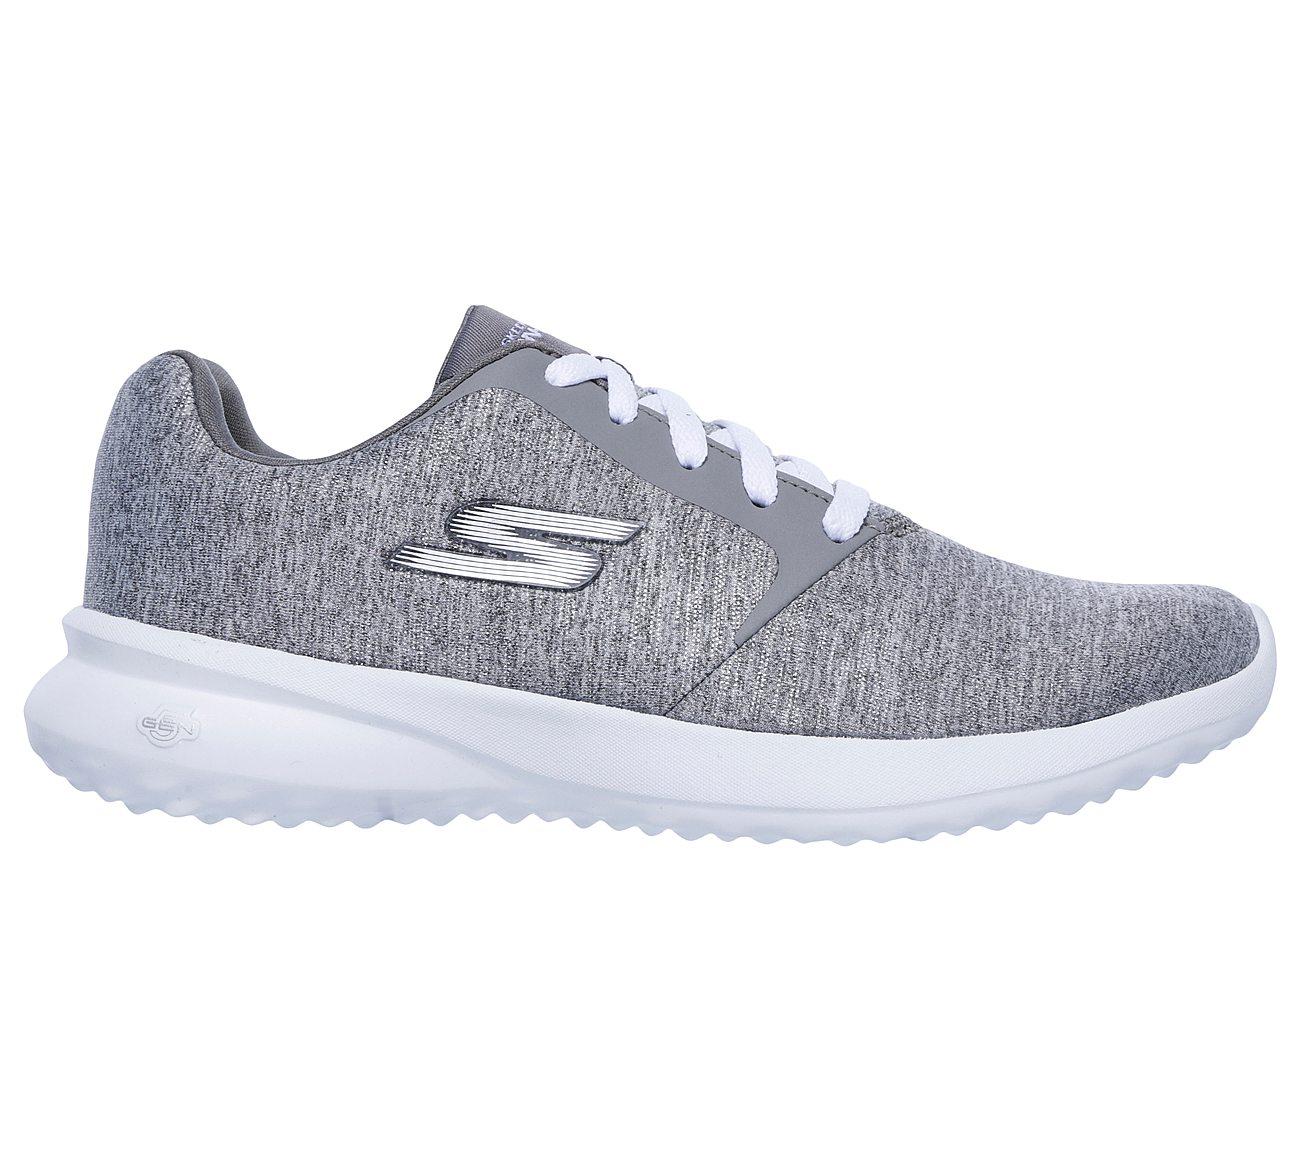 Buy SKECHERS Skechers On the GO City 3